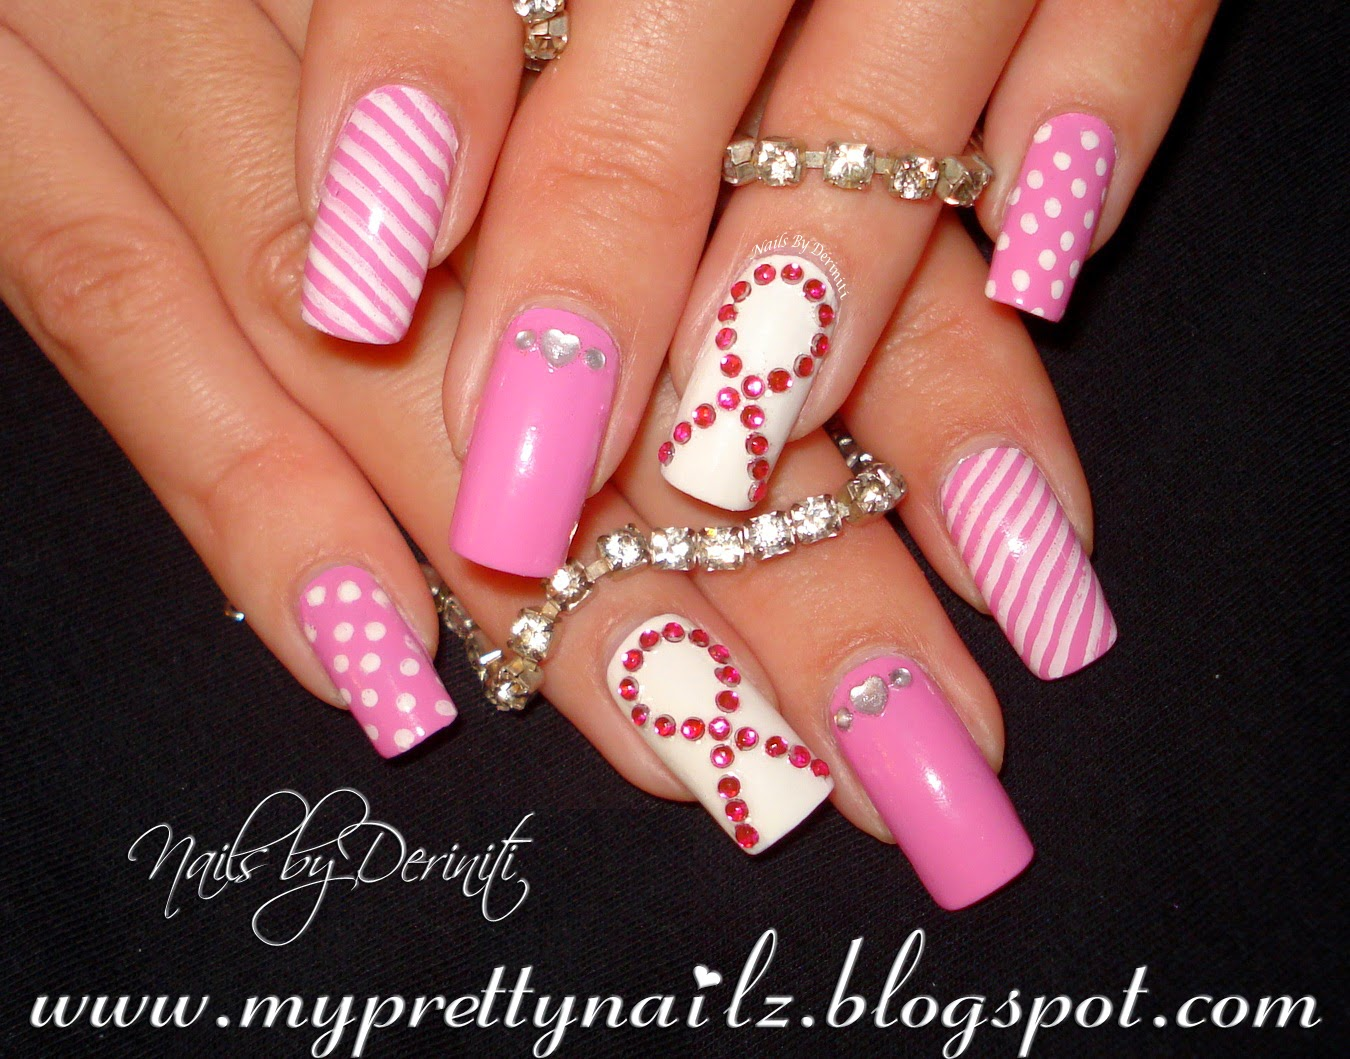 ... Pink Black Nails on Pinterest Square Nails Emo Nail Art - pink n white nail  designs ... - Pink N White Nail Designs